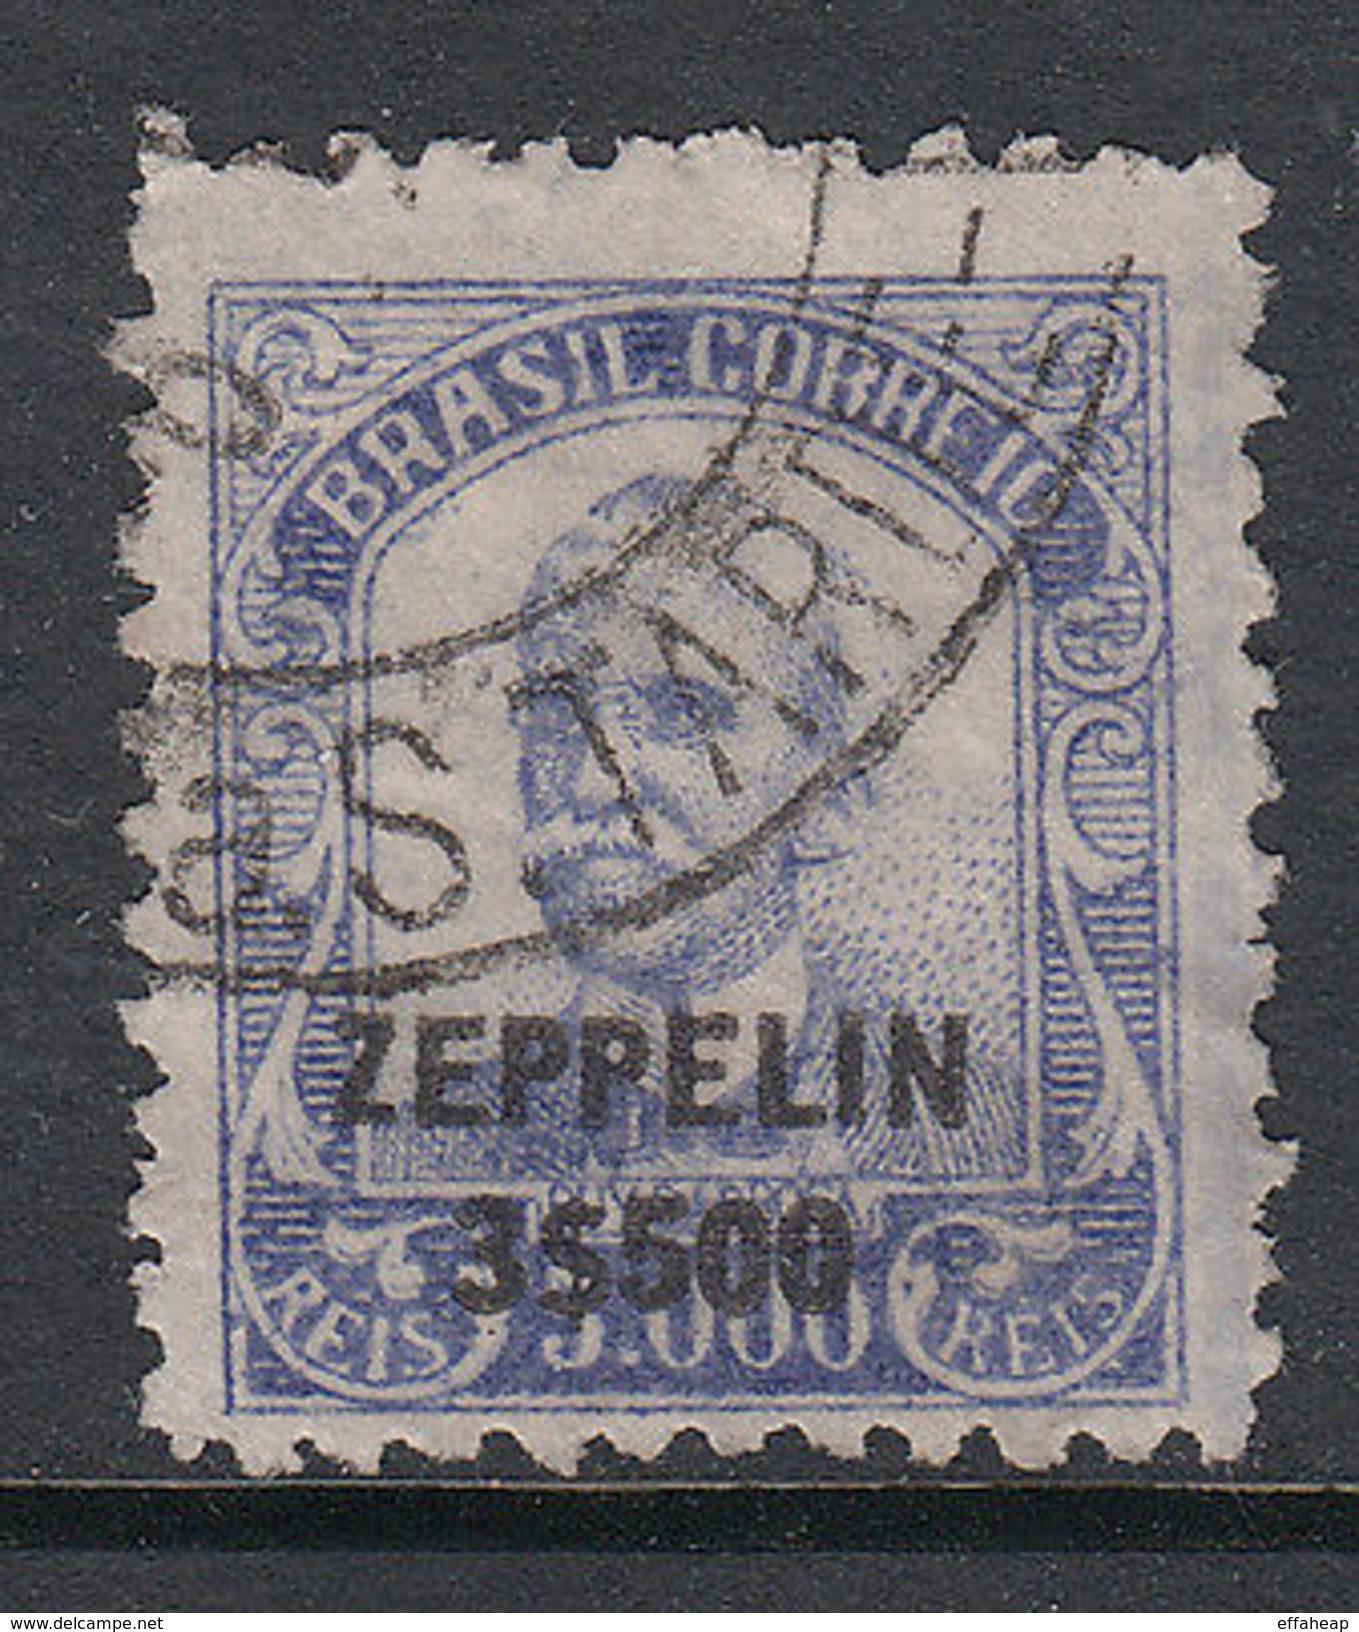 Brazil: Ruy Barbosa Overprinted Zeppelin 3$500 On 500r Blue, Used, C. 1931 - Unclassified